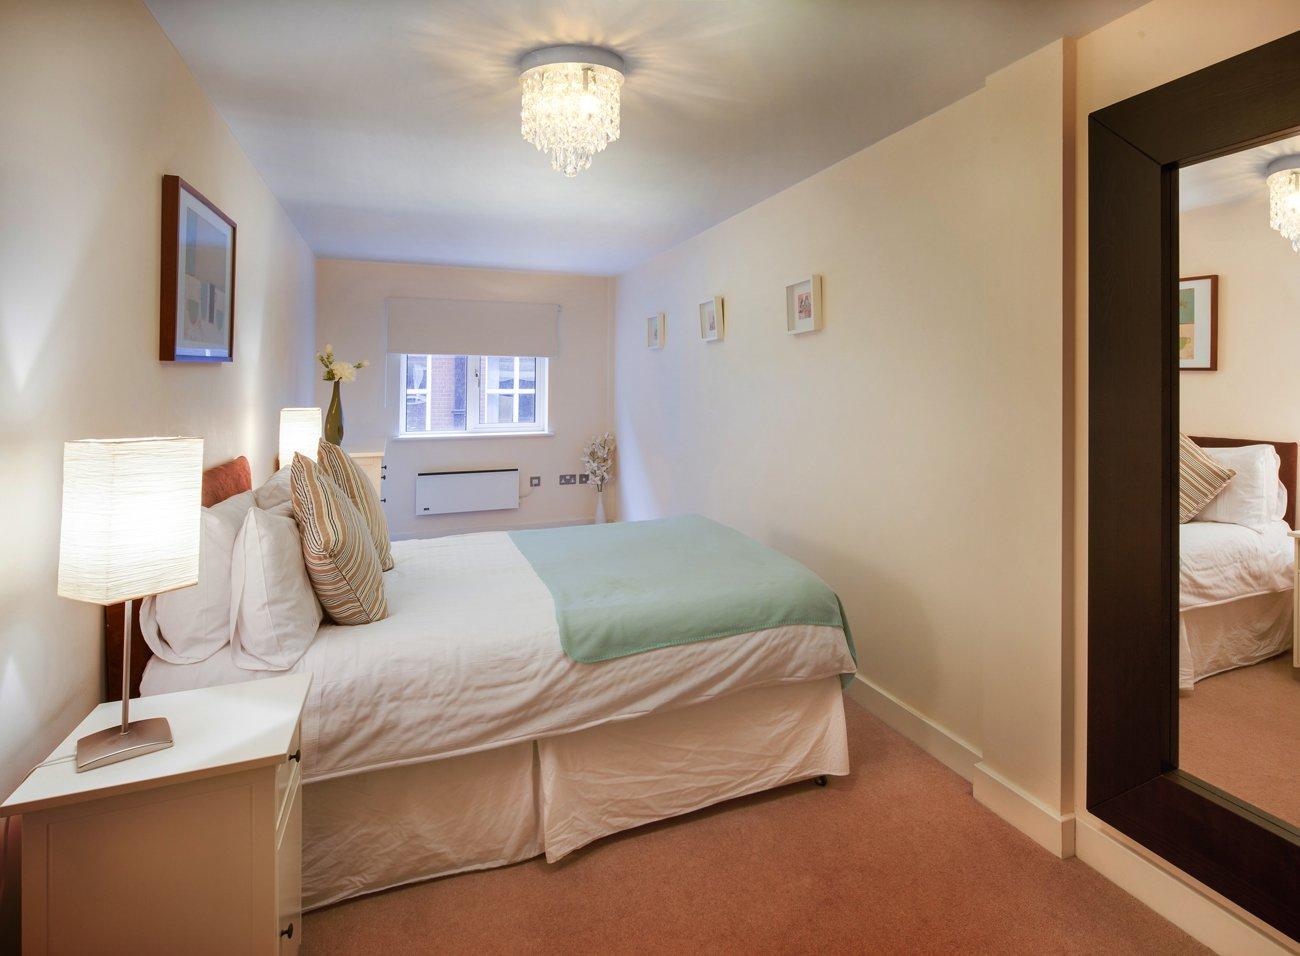 SHINE HAI Crystal Chandelier, 3-light Modern Flush Mount Ceiling Pendant Light H9.45'' X W8.66'' for Bedroom, Living Room, Dining Room, Kitchen, Hallway by SHINE HAI (Image #8)